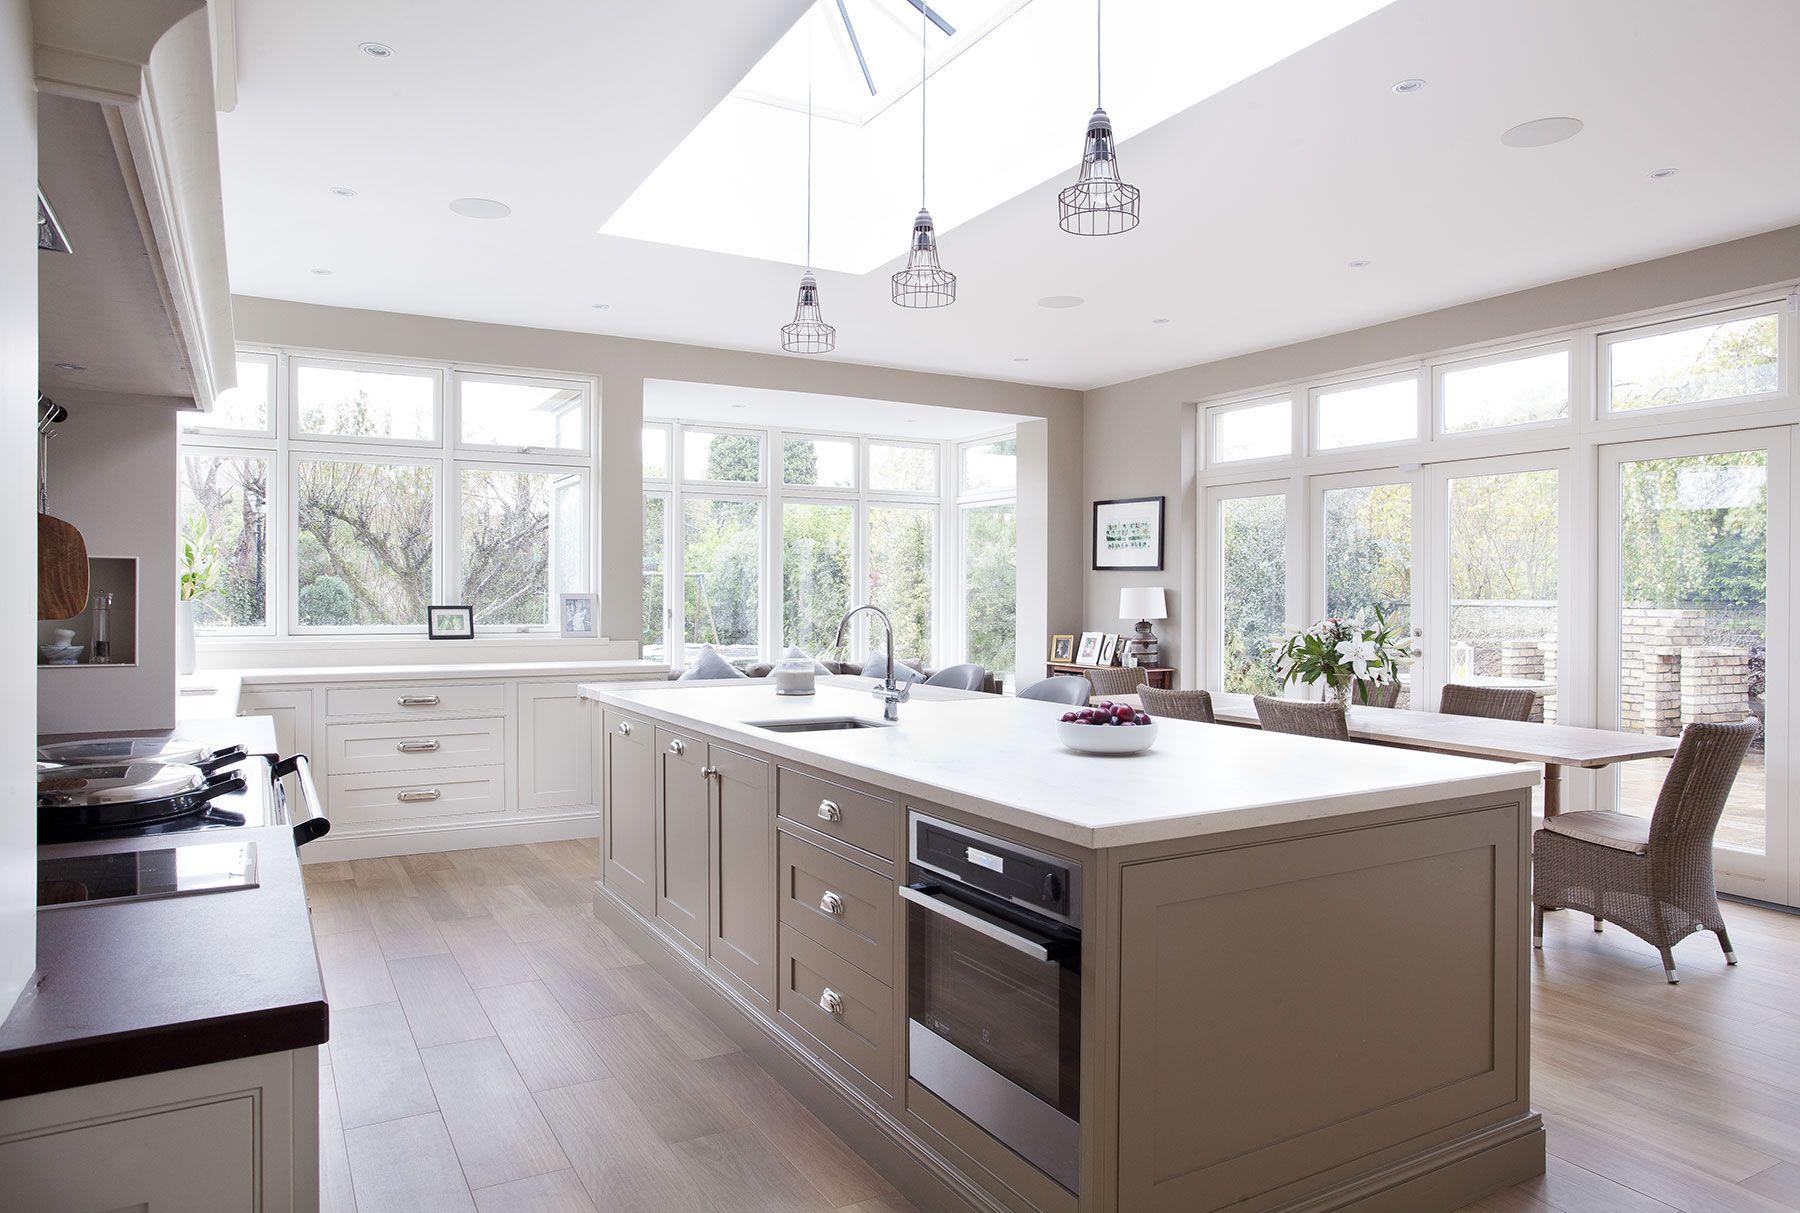 Skylight, windows, light woods Woodale Designs Luxury